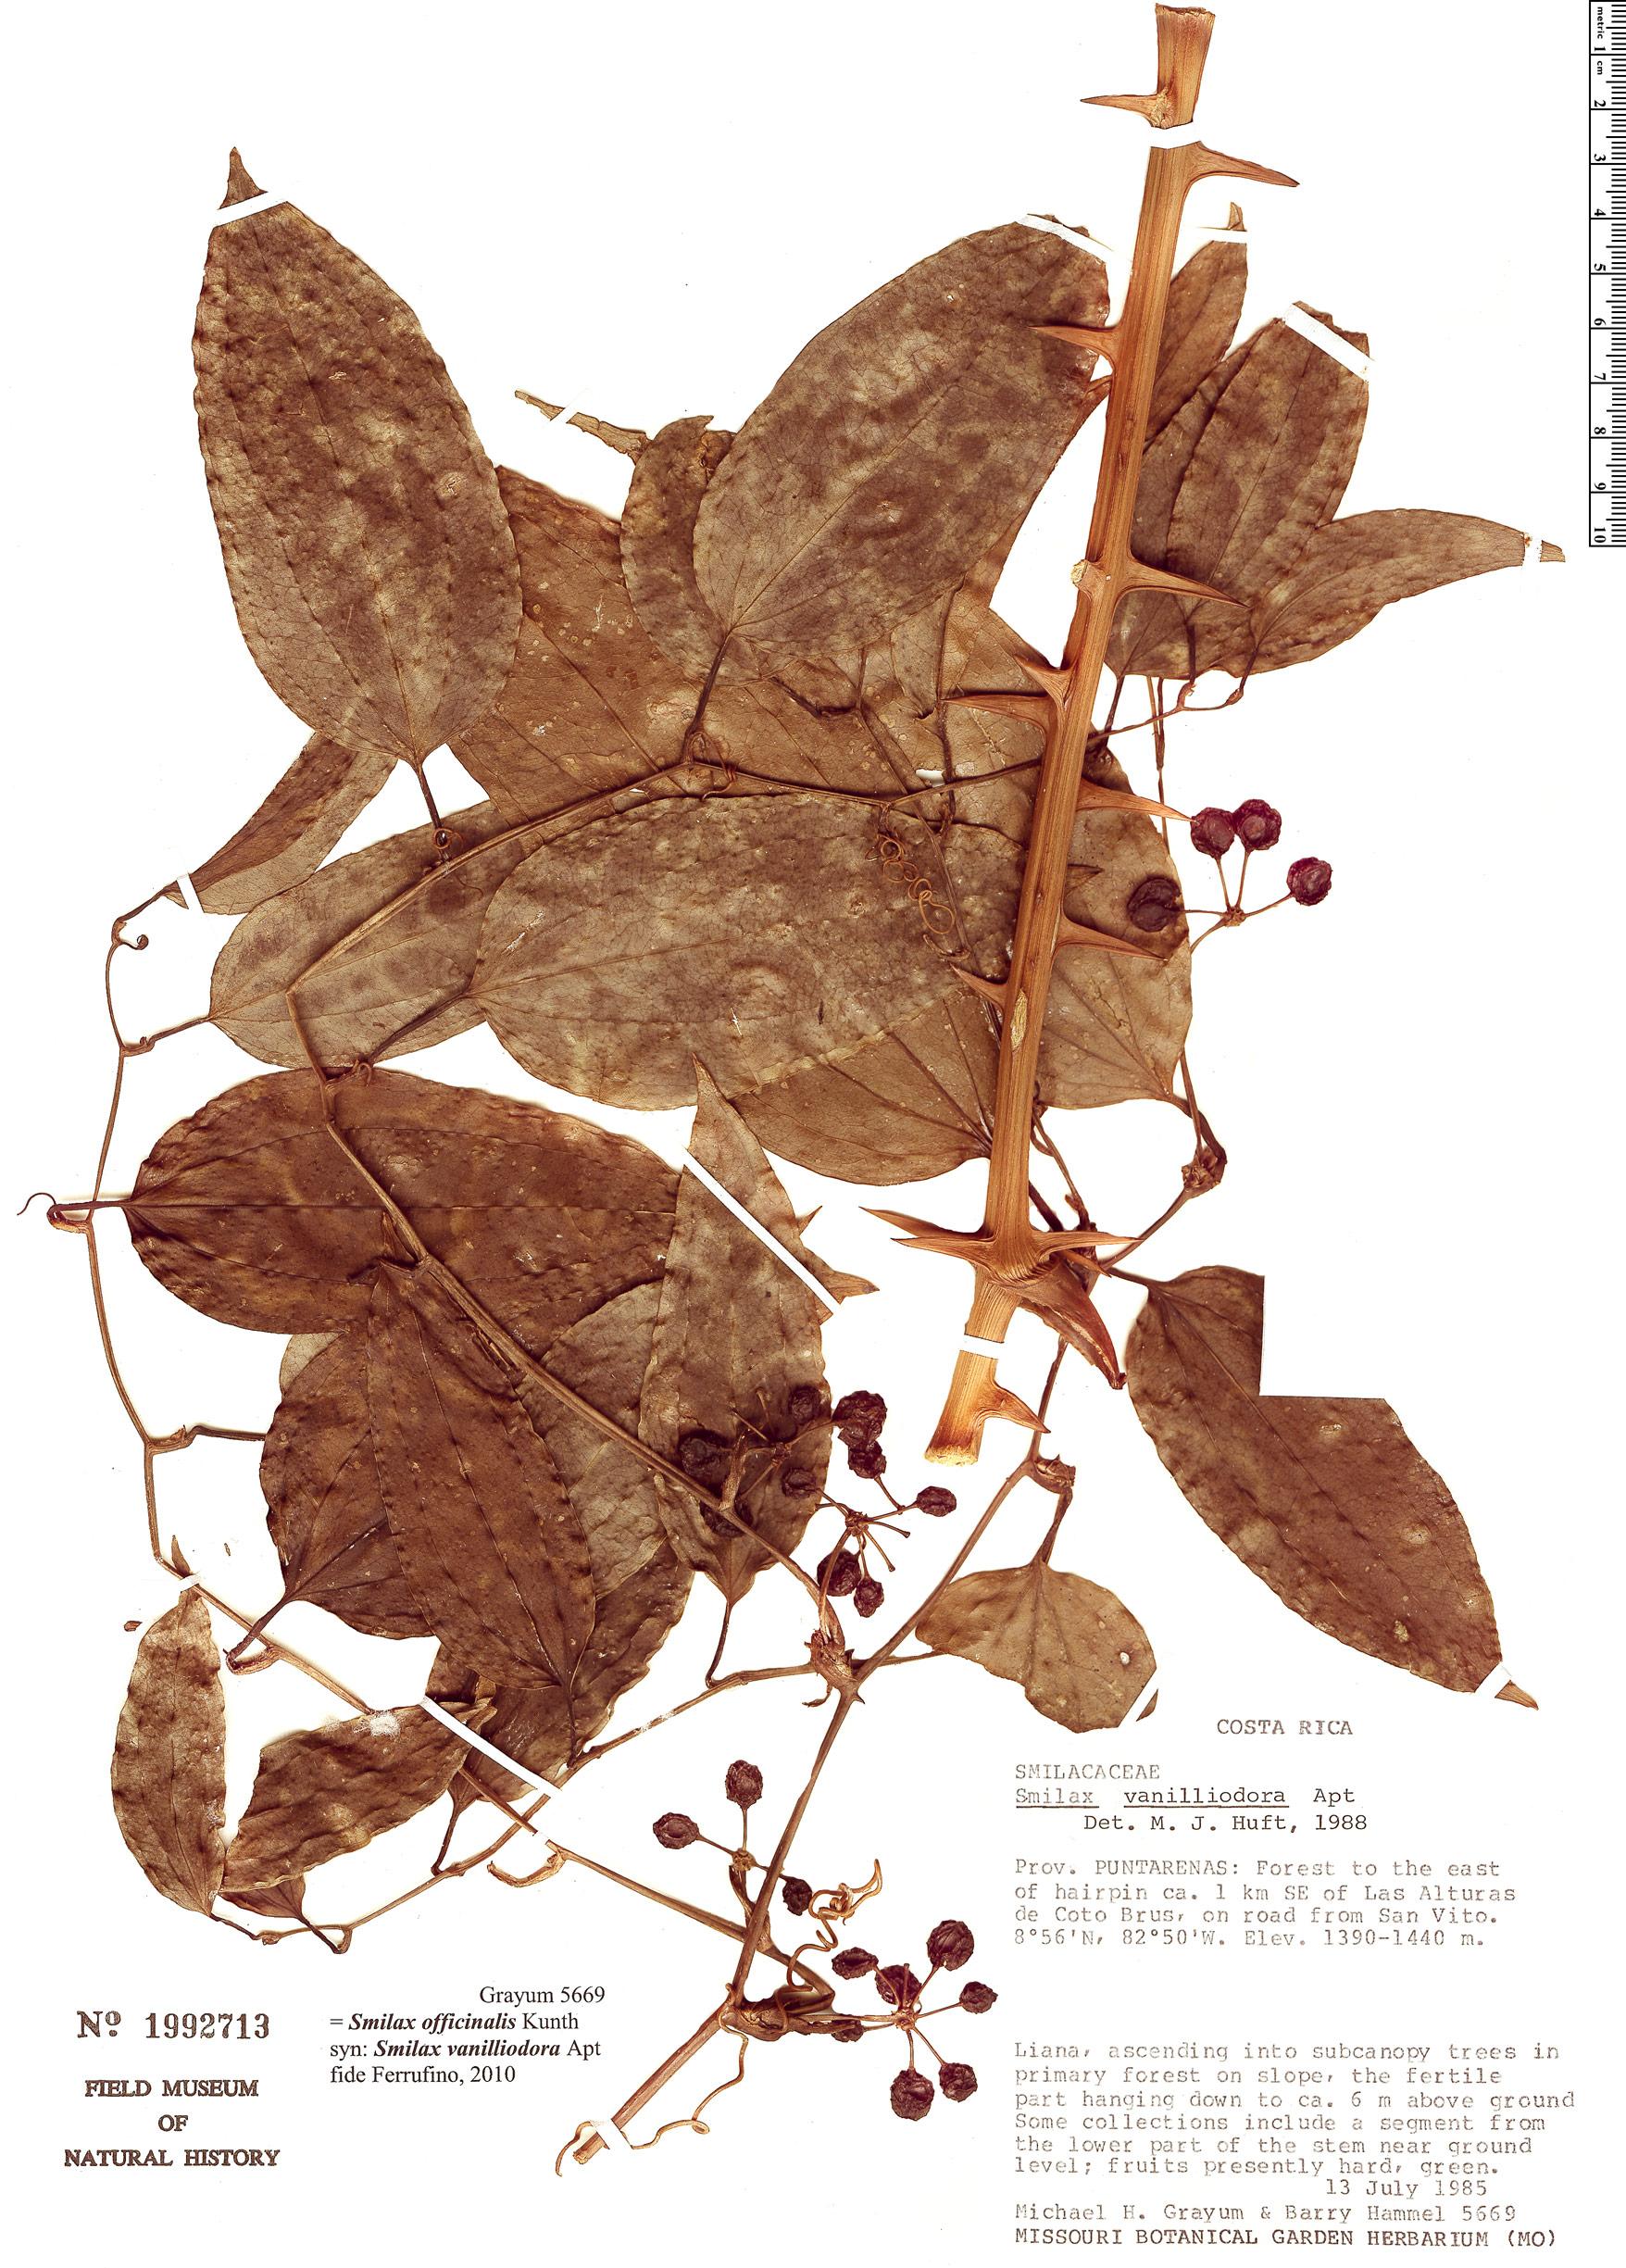 Espécimen: Smilax febrifuga